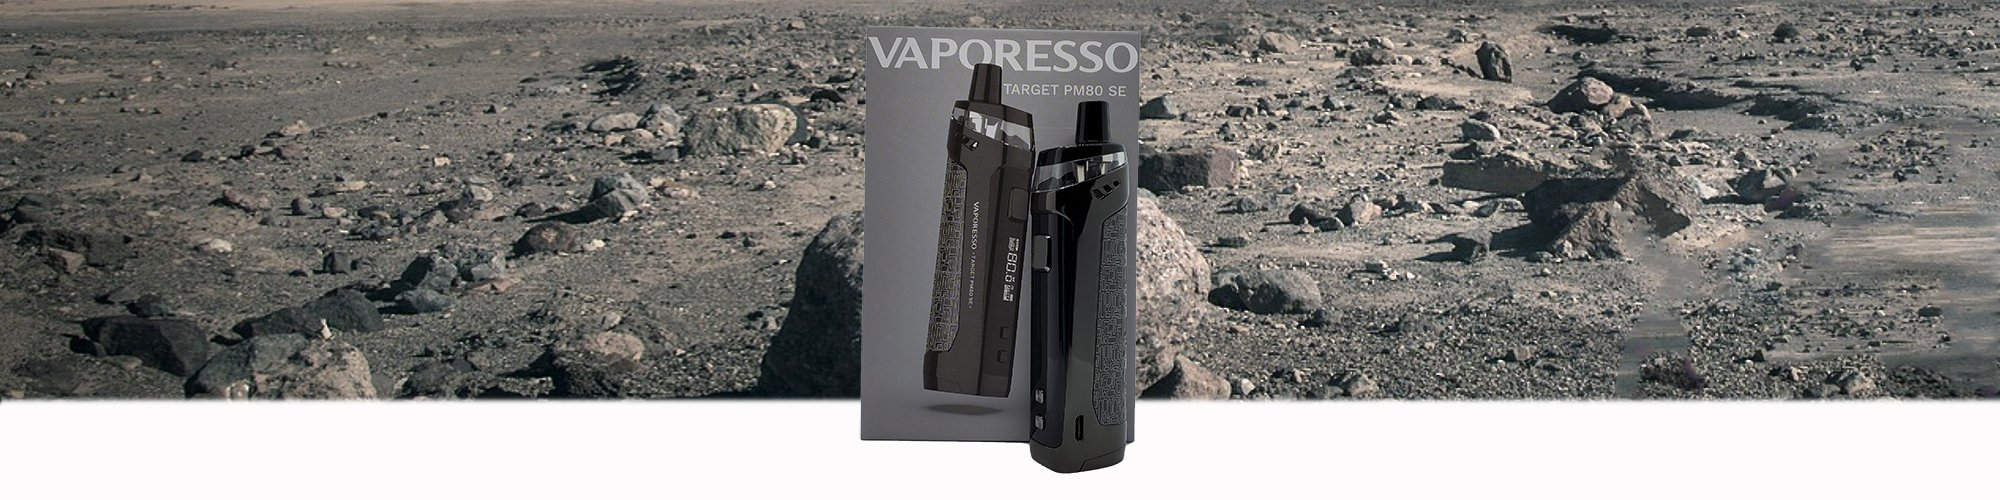 Vaporesso Target PM80 SE Review Main Banner